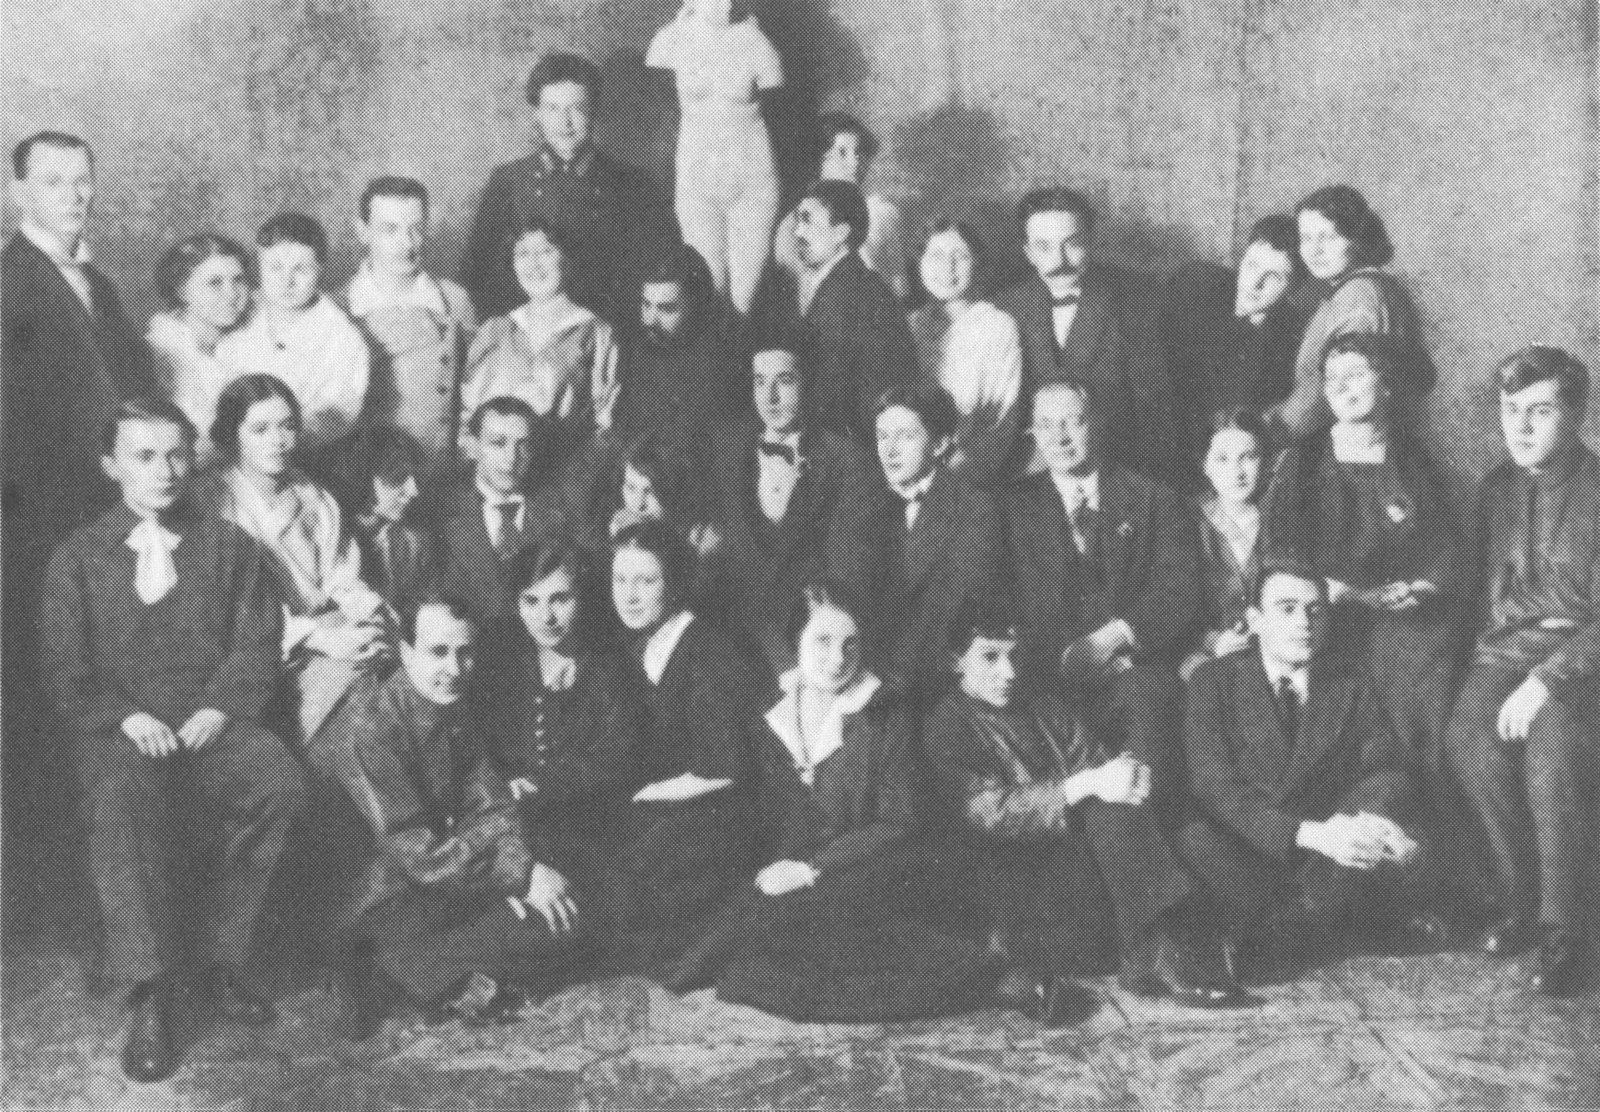 http://upload.wikimedia.org/wikipedia/commons/9/92/Student%27s_studio_1915.jpg